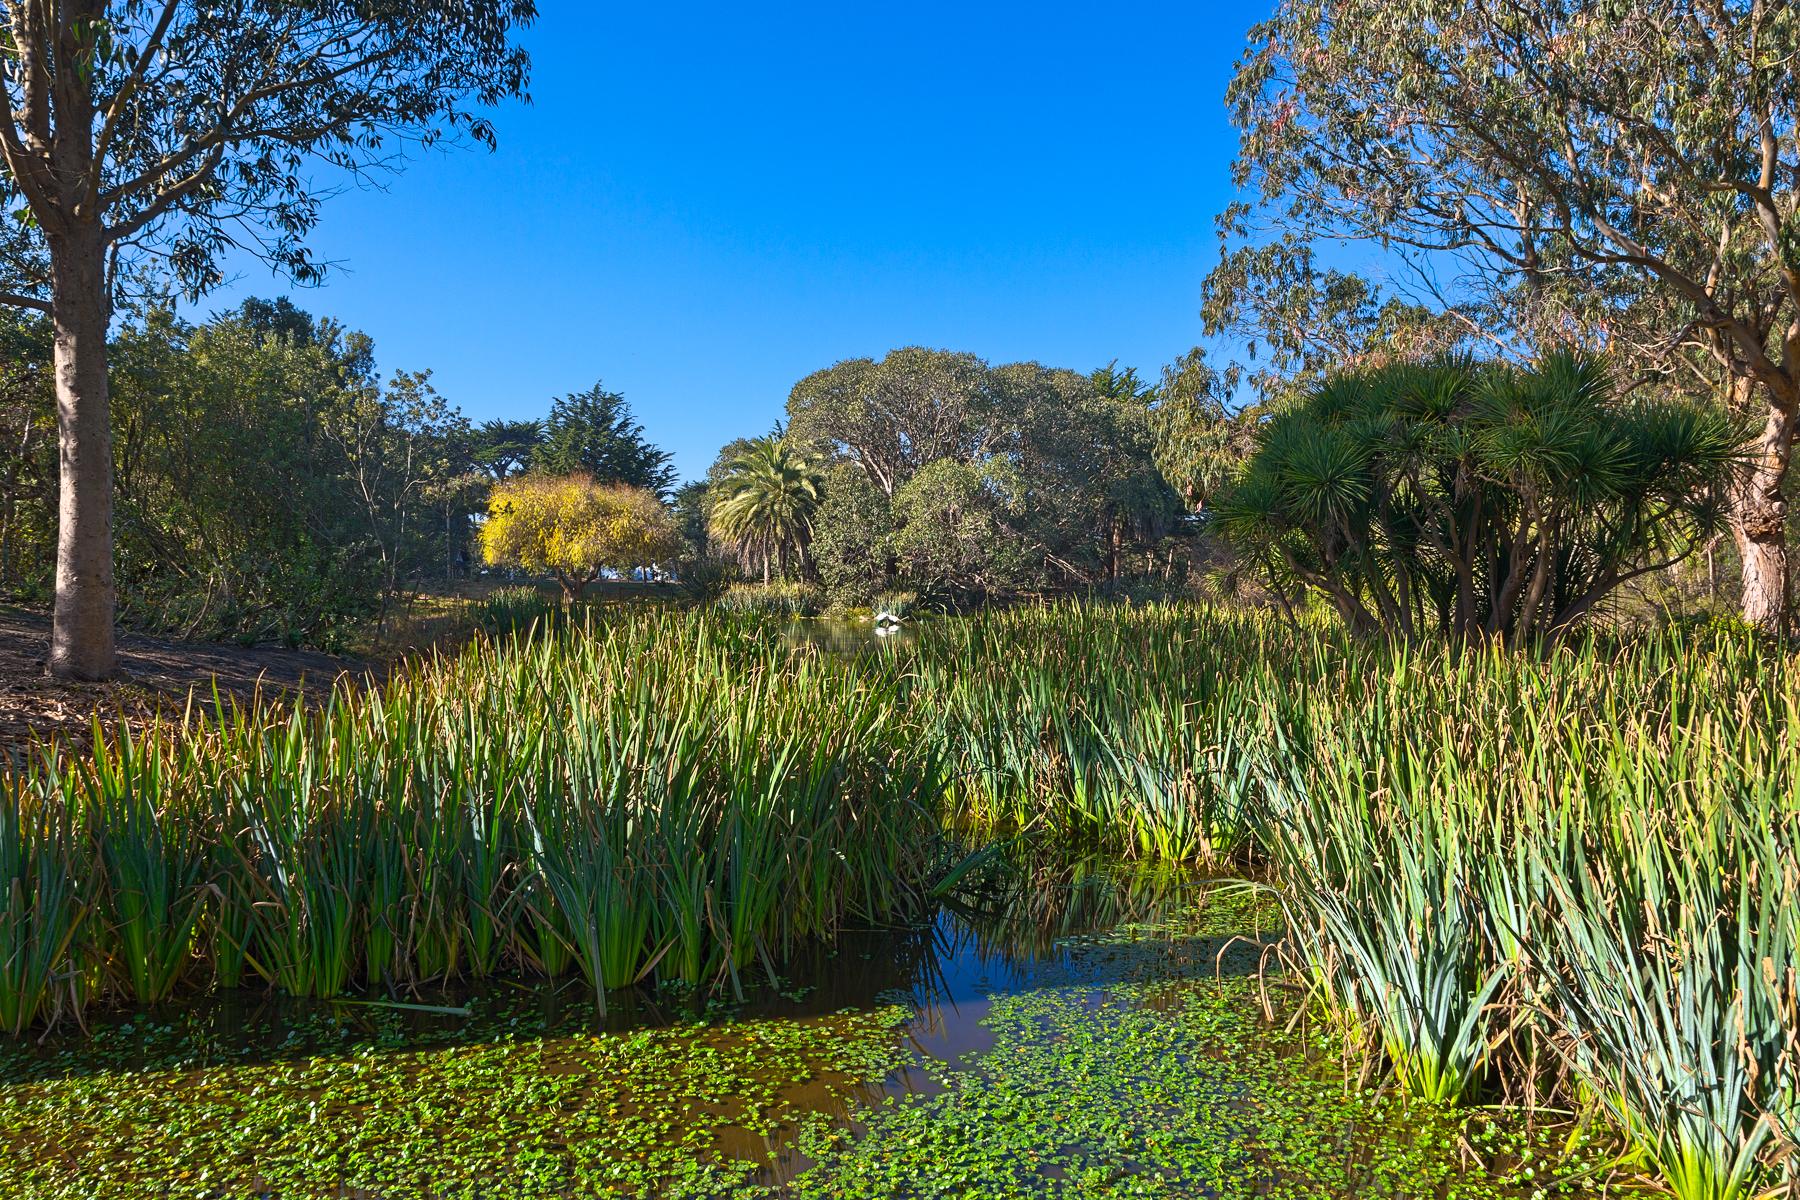 Zoo Marsh Scenery - HDR, America, Serene, Tourism, Swamp, HQ Photo